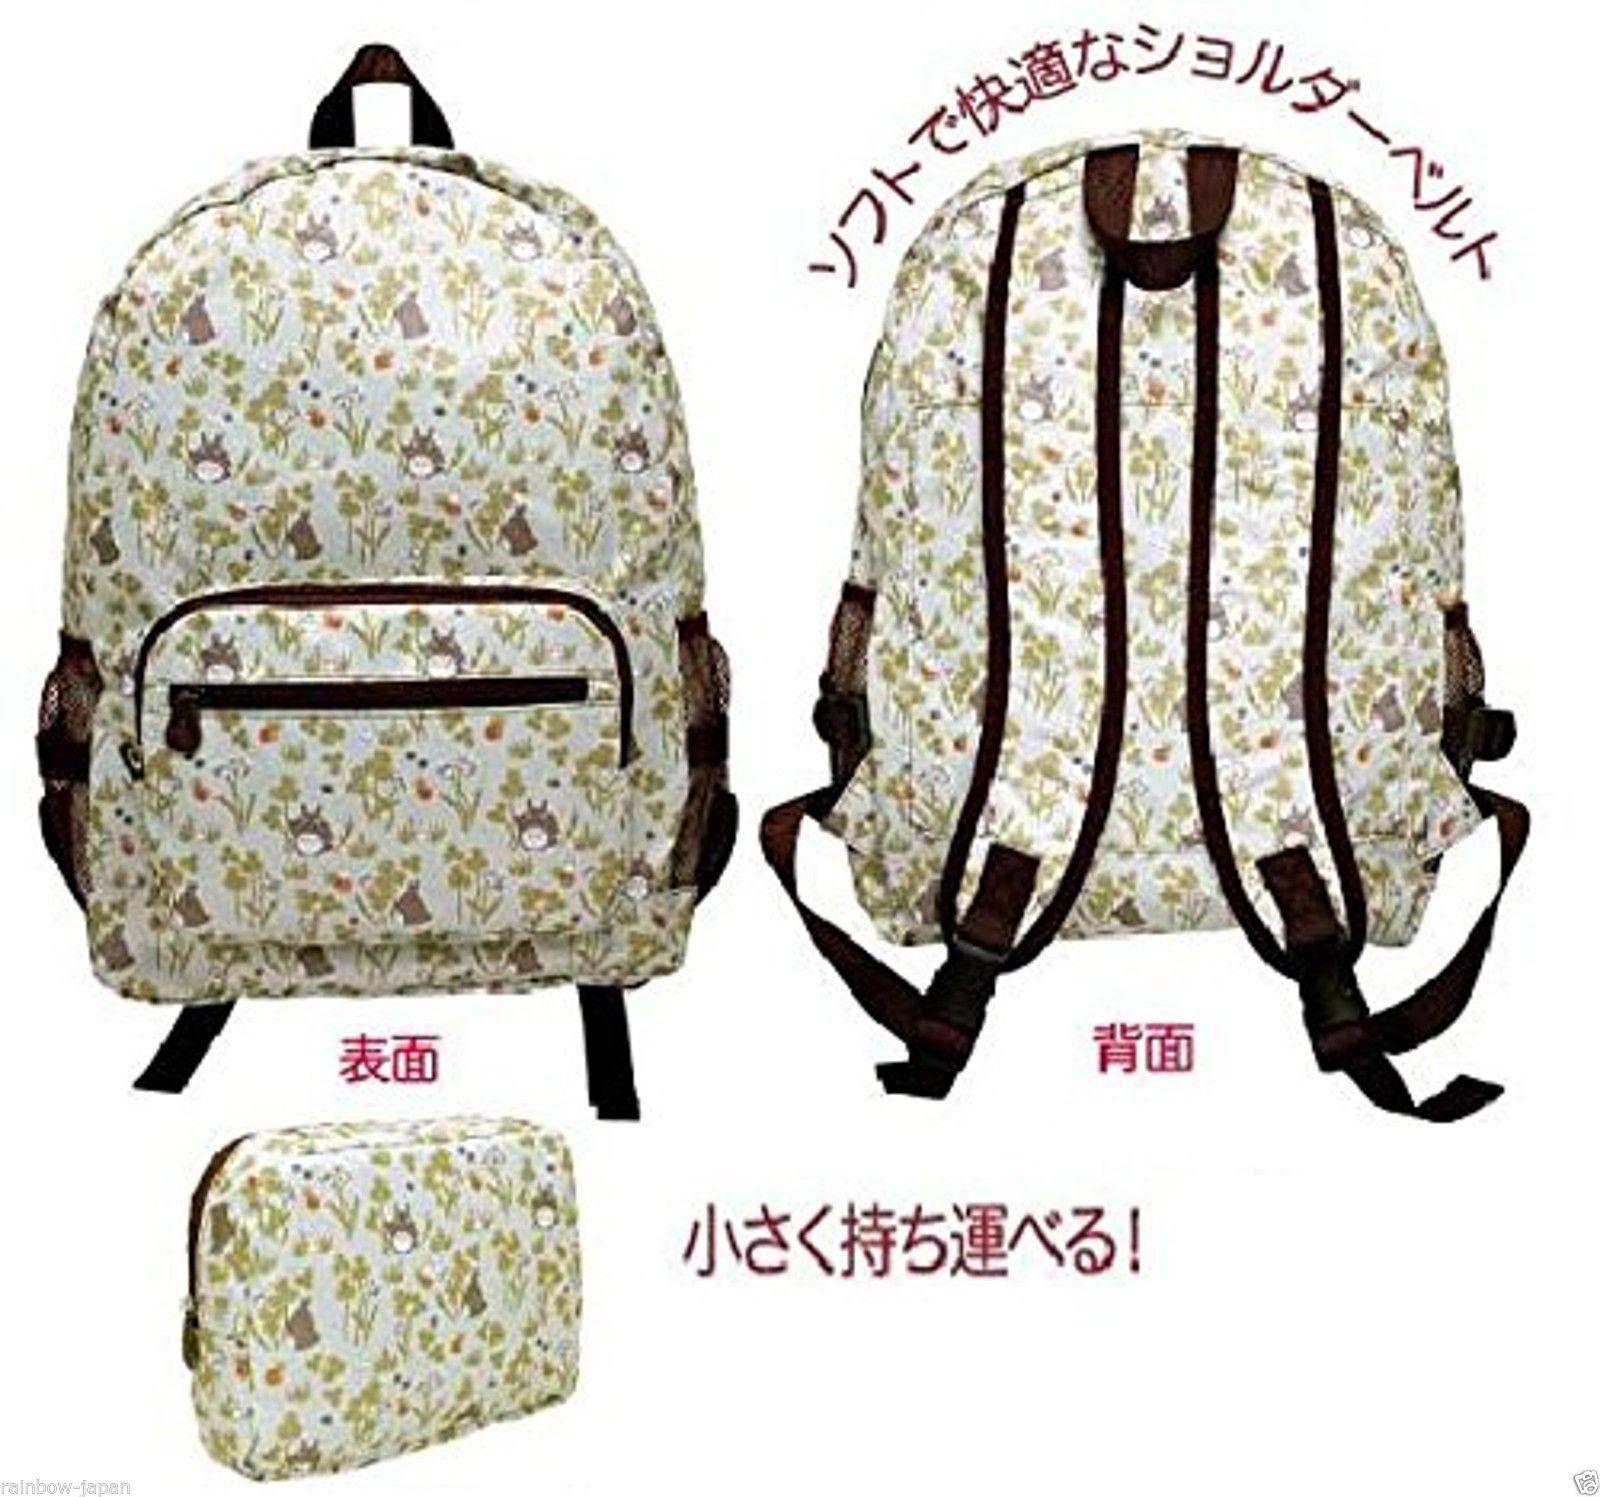 My Neighbor Totoro Compact Backpack Anime Studio Ghibli